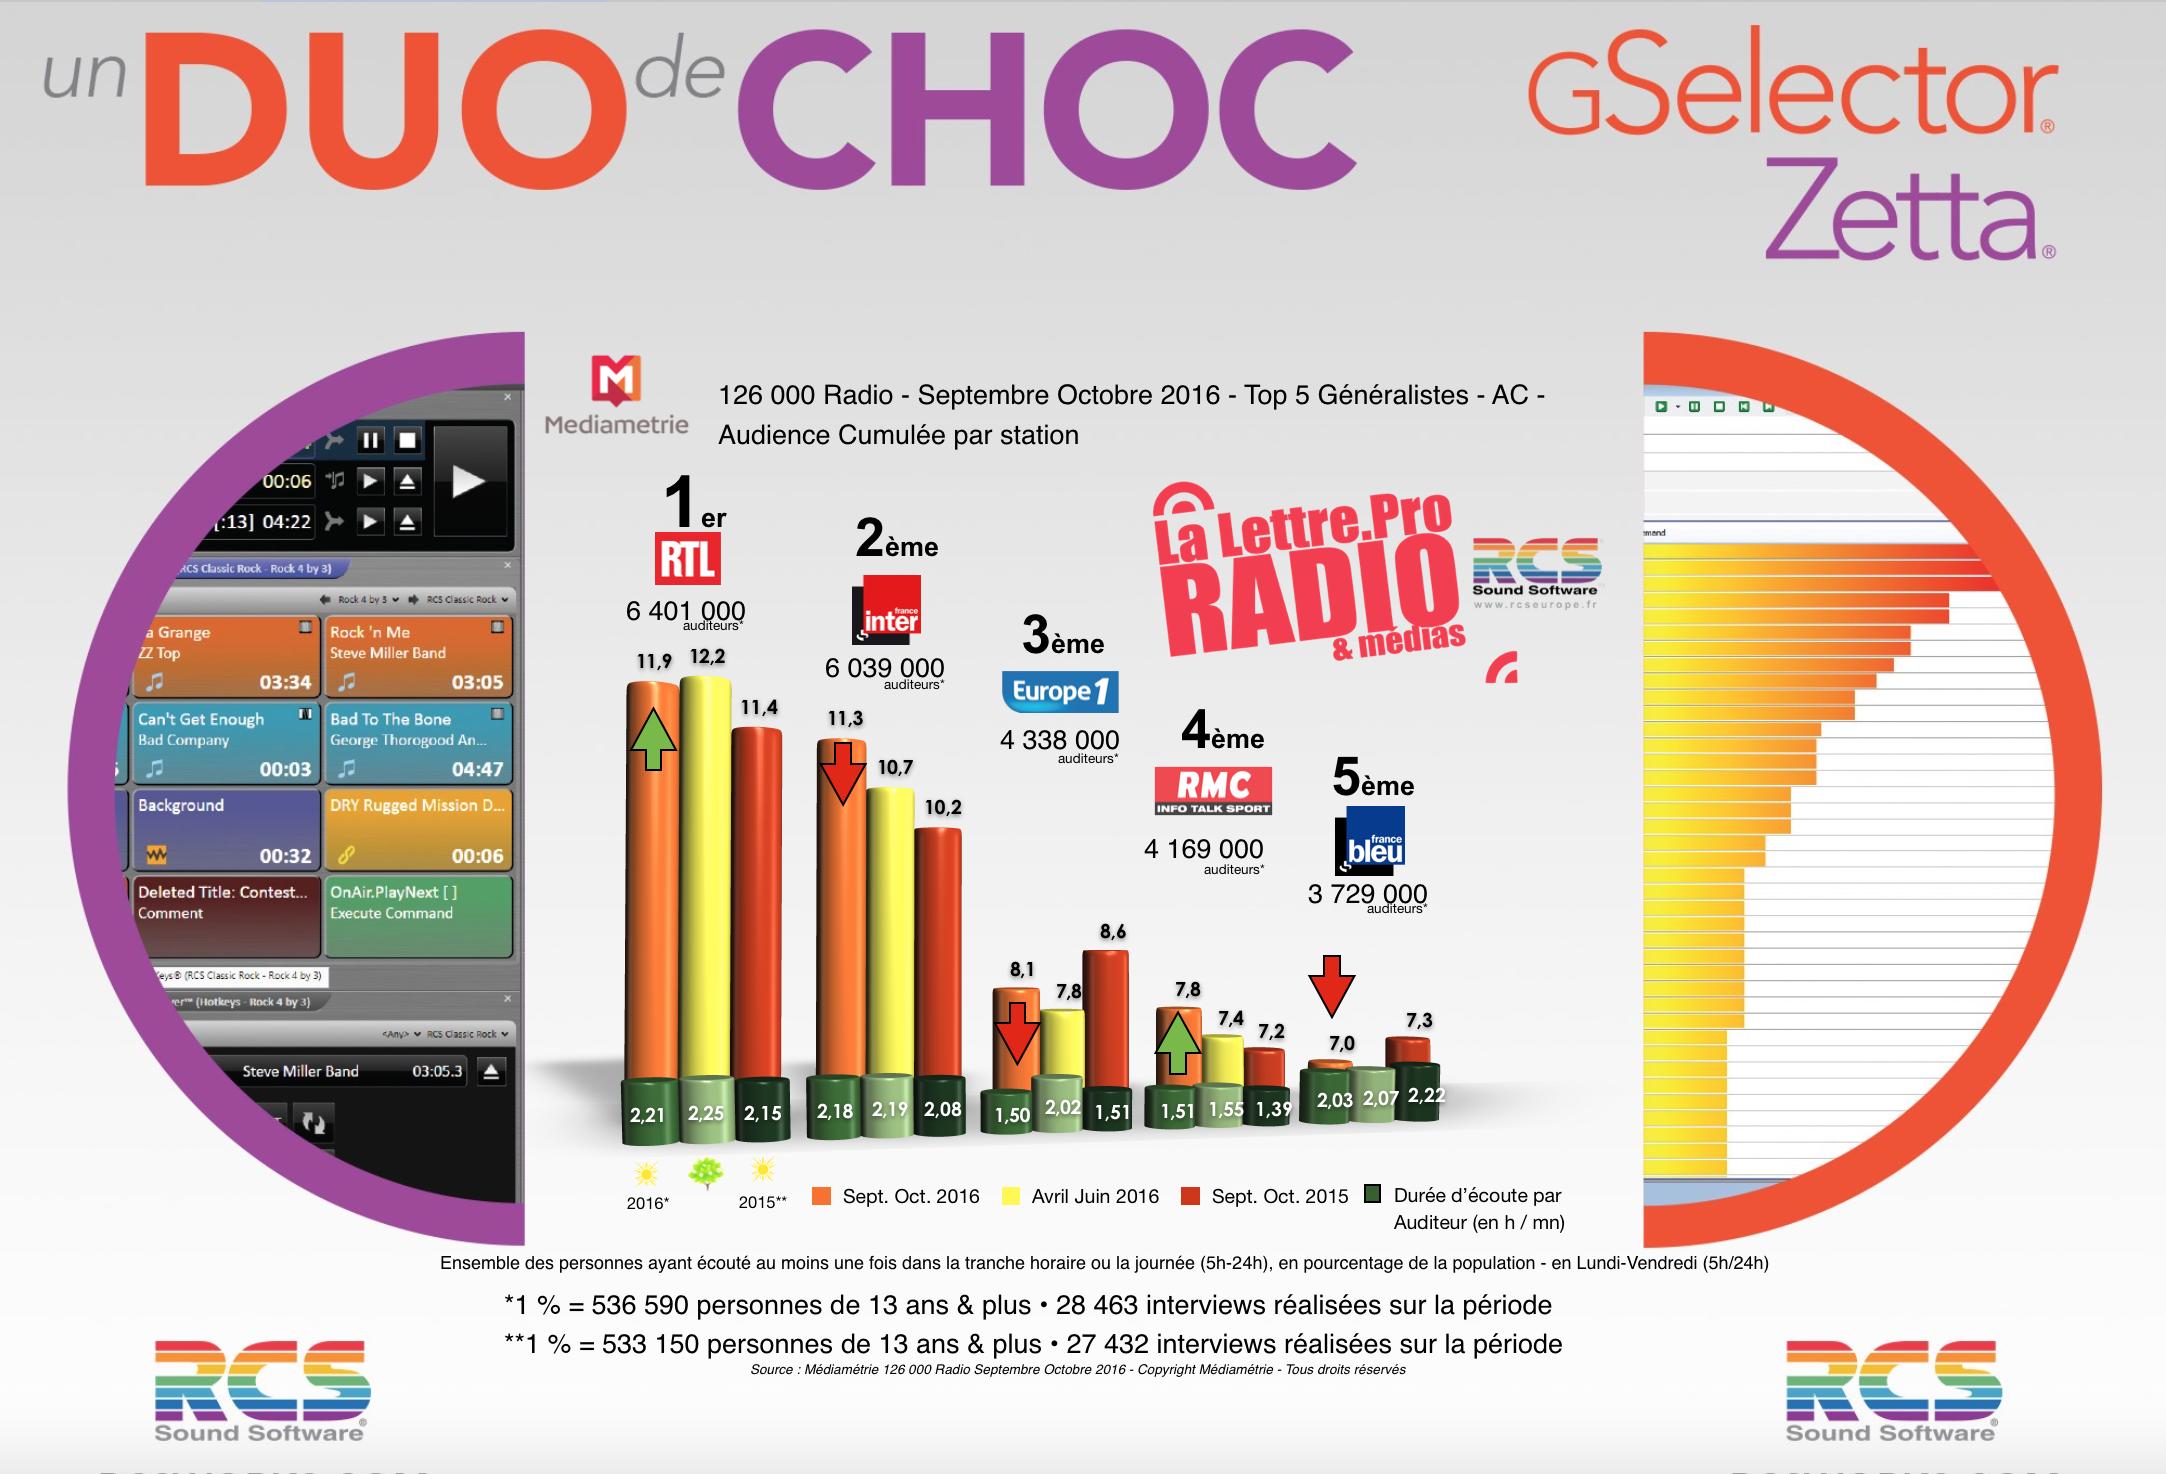 Diagramme exclusif LLP/RCS GSelector 4 - TOP 5 radios Généralistes en Lundi-Vendredi - 126 000 Radio Septembre-Octobre 2016